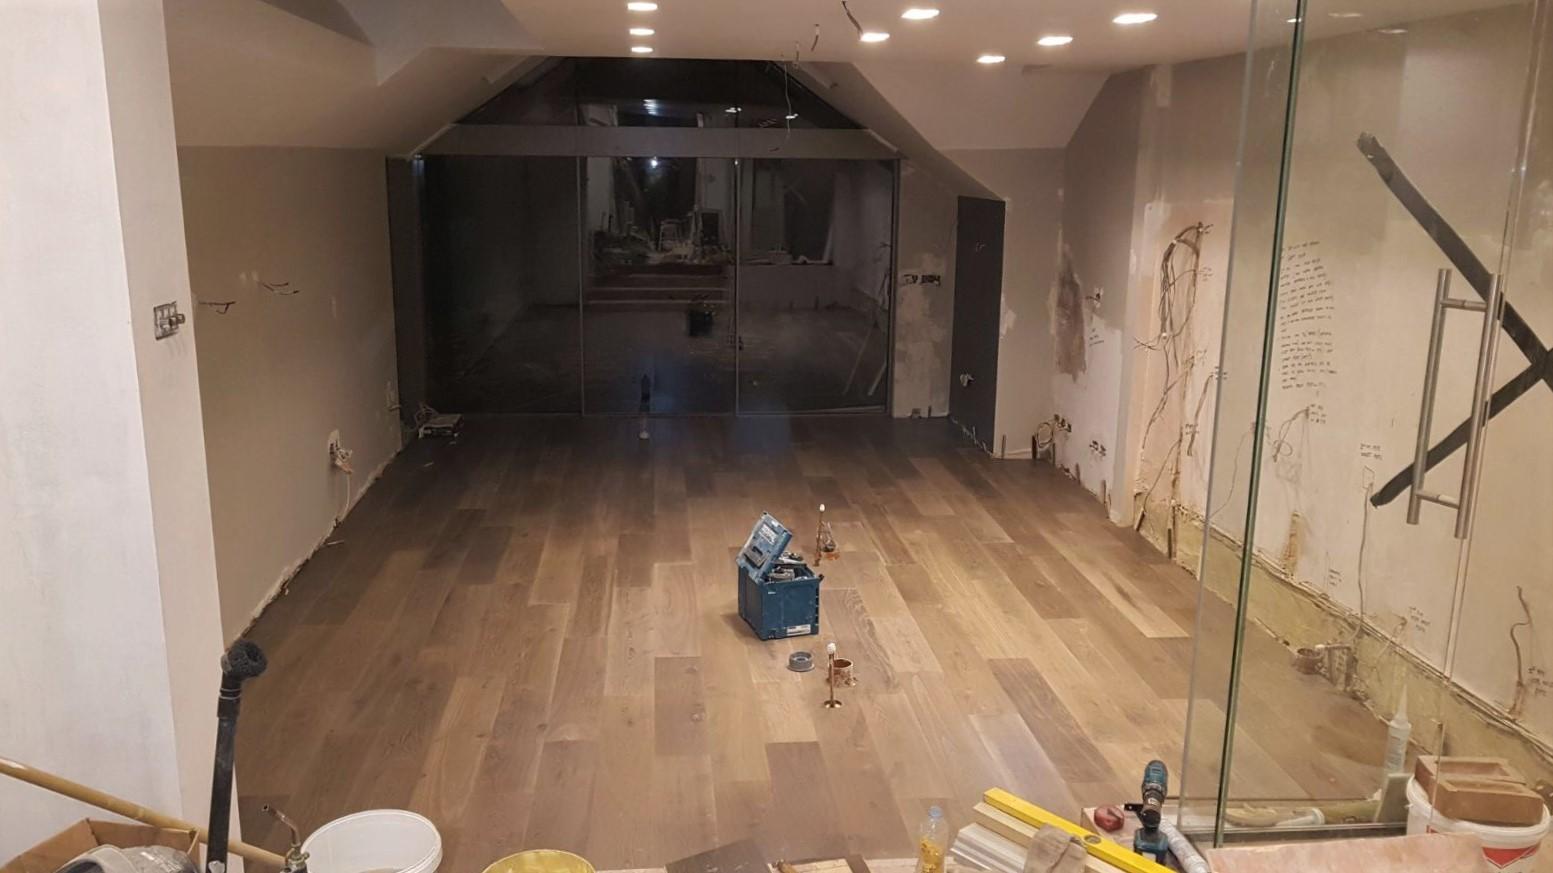 Kitchen renovation work in progress, view from inside